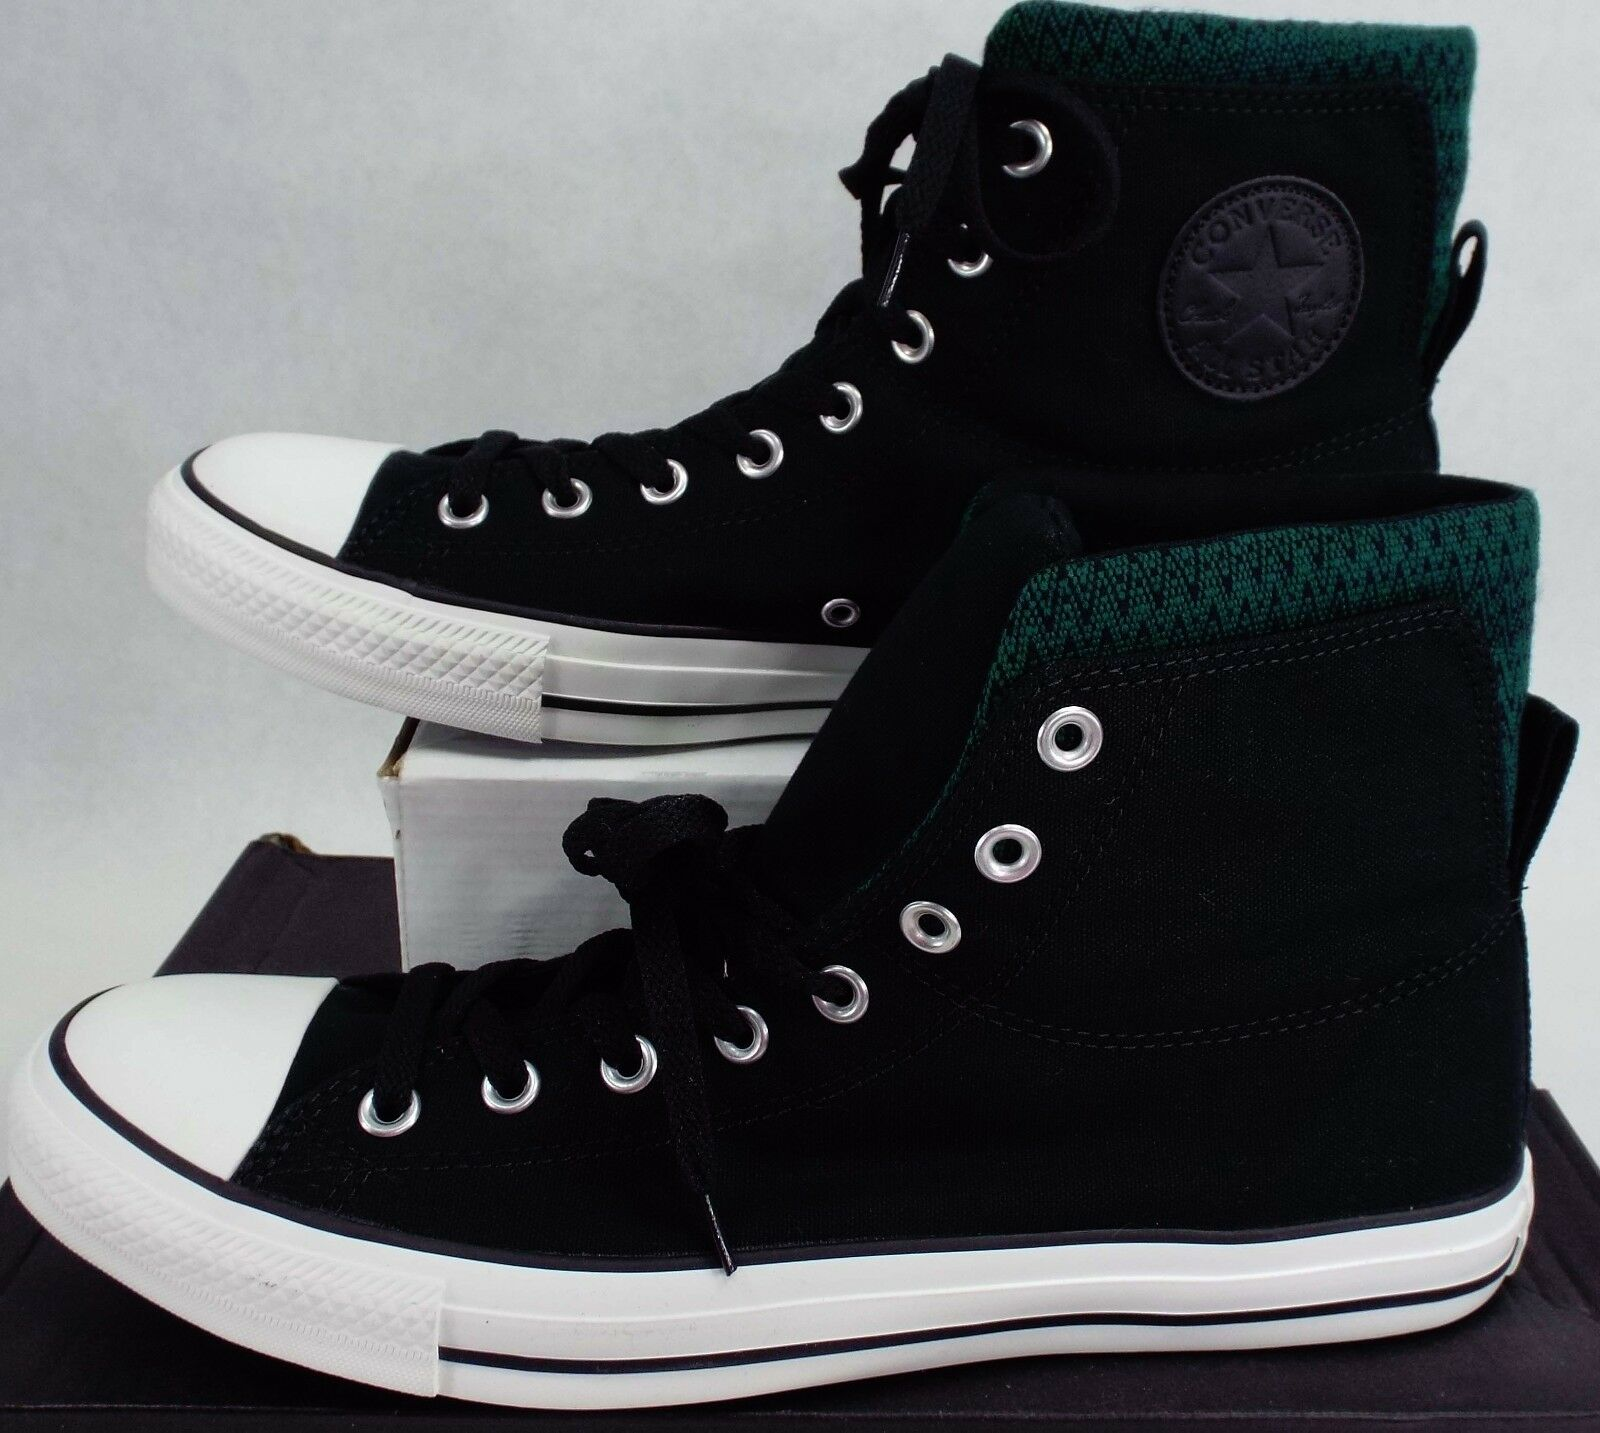 New Mens 11 CONVERSE CT Dual Collar Black Pine Green Shoes $60 140015F